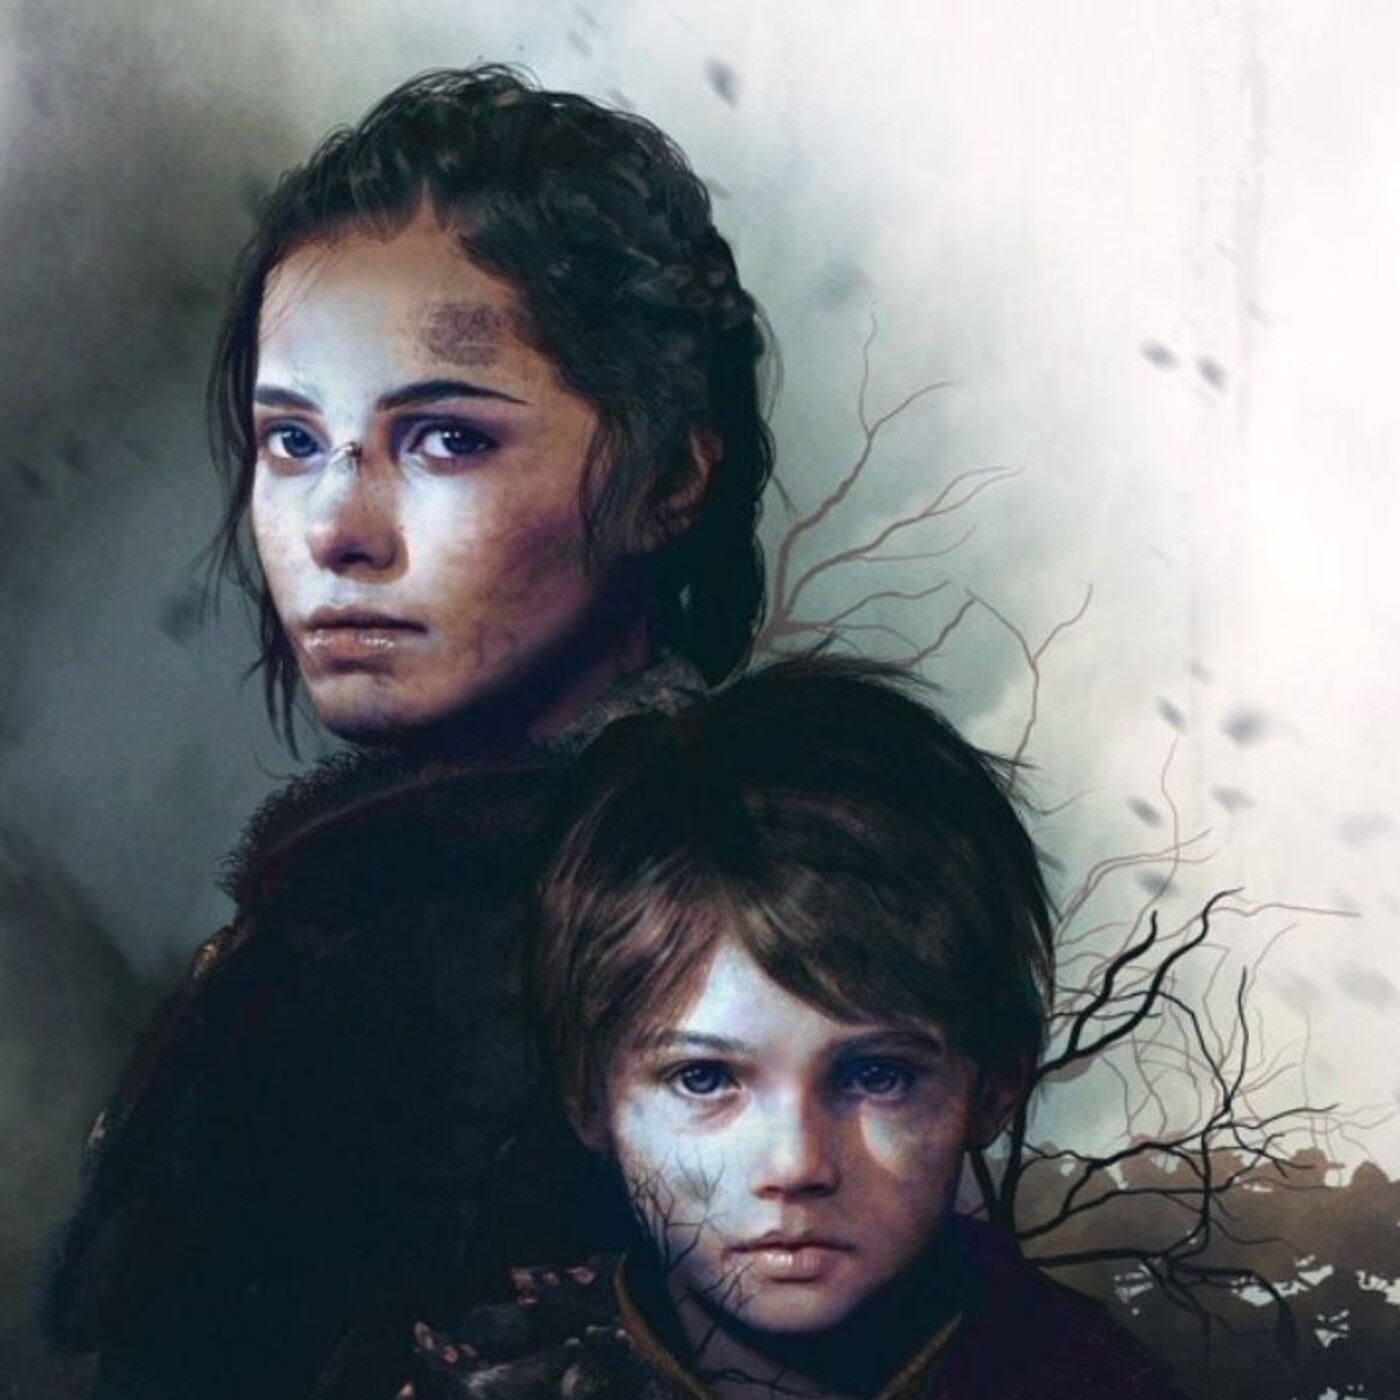 Indieteca 1x38: Análisis de A Plague Tale Innocence